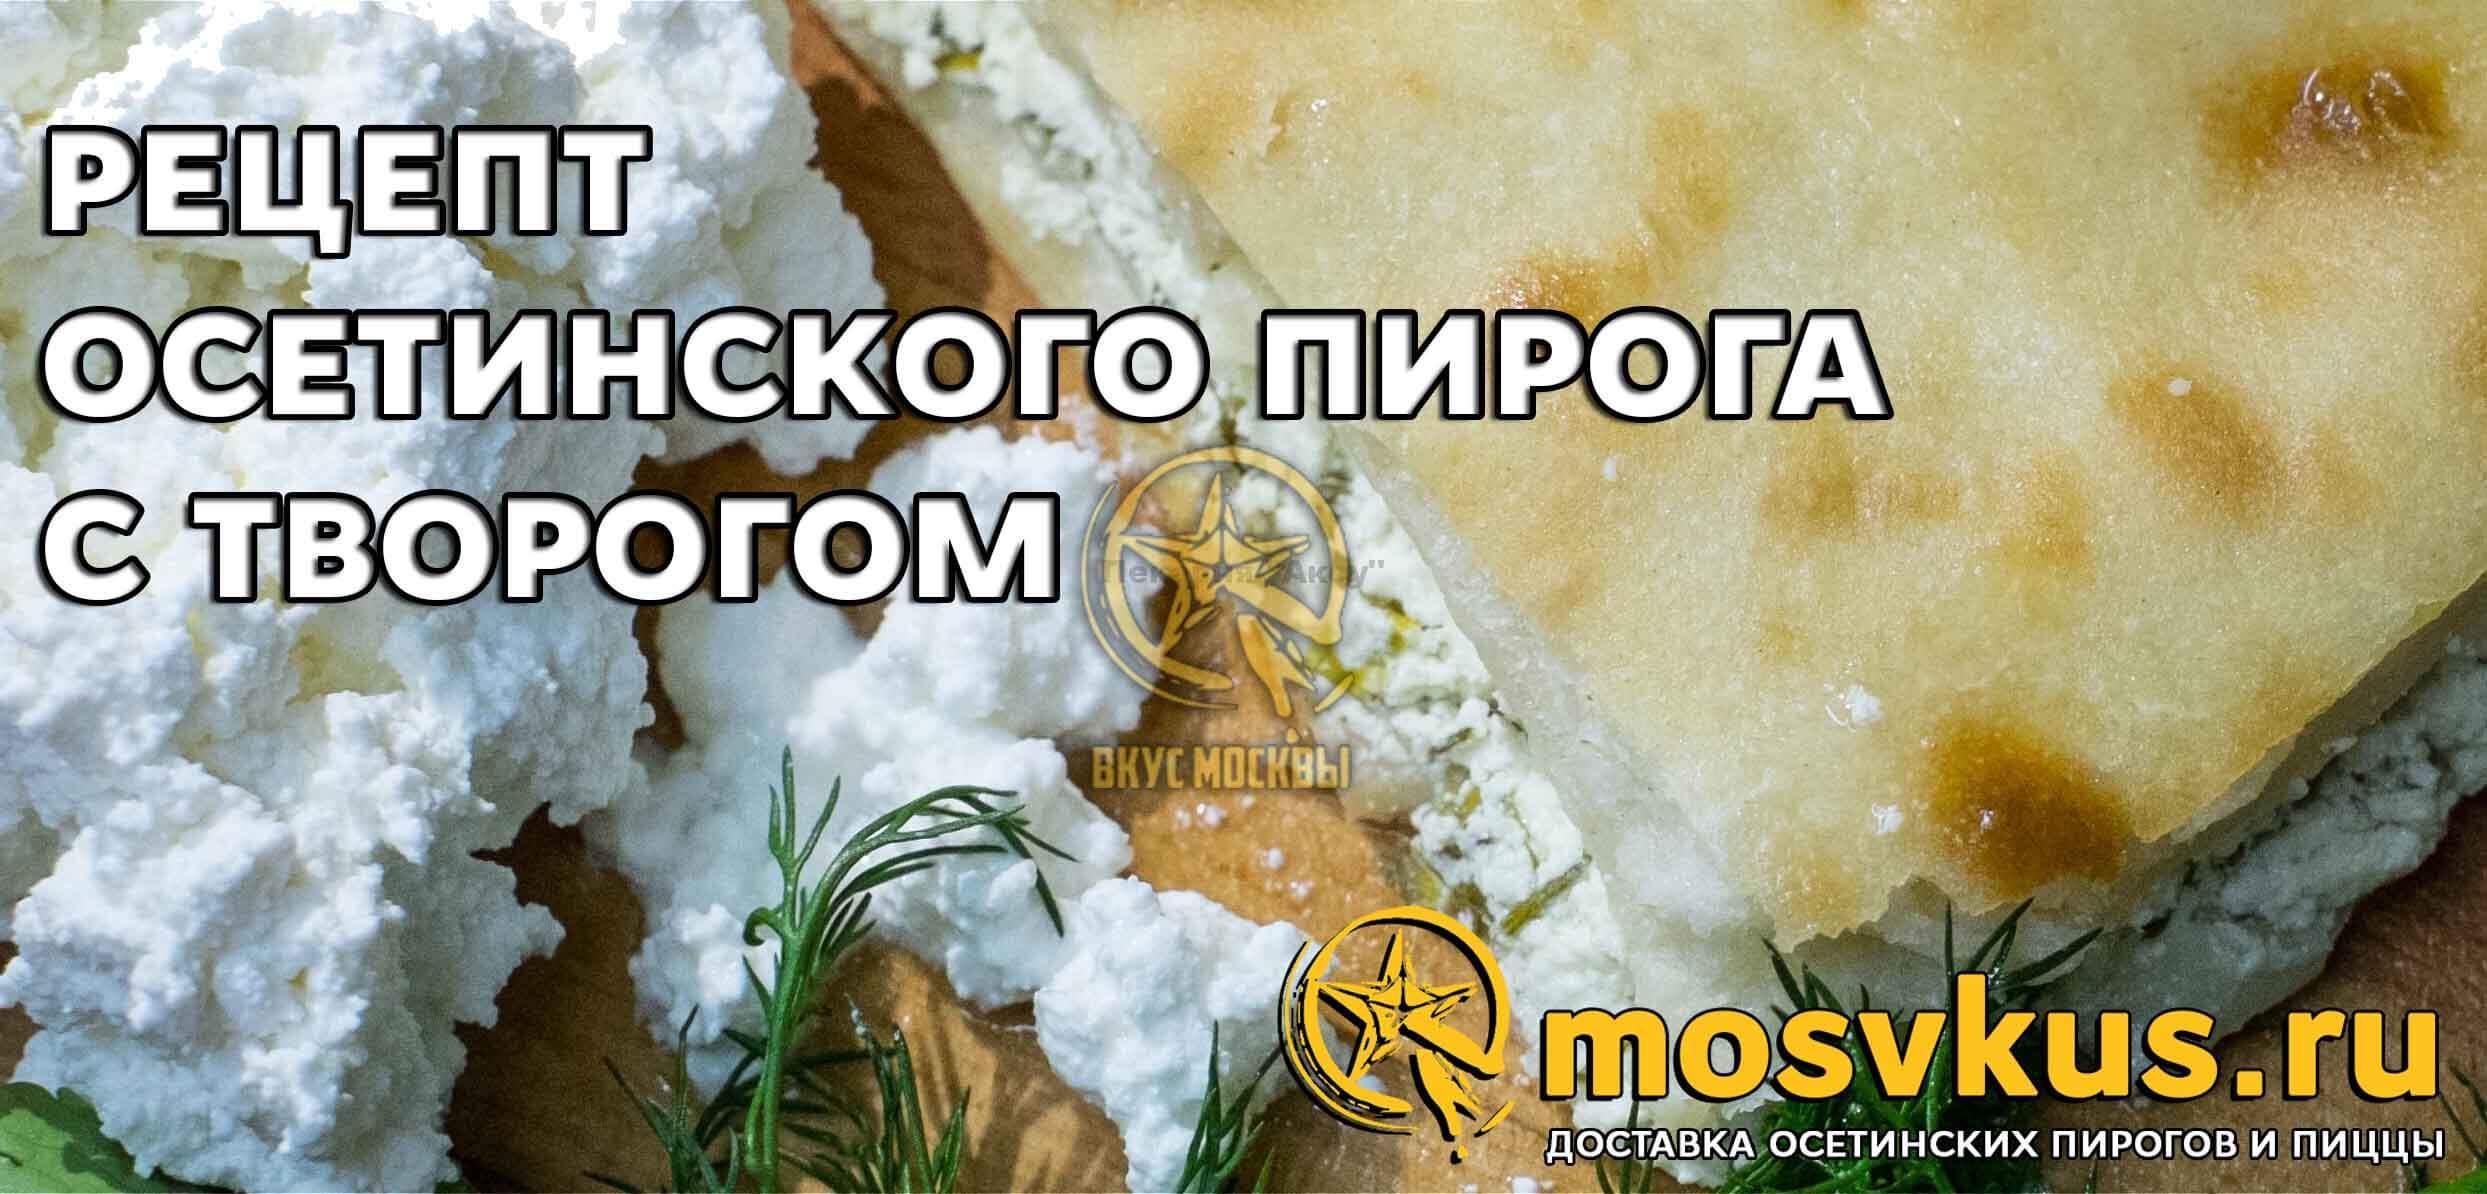 рецепт осетинского пирога с творогом